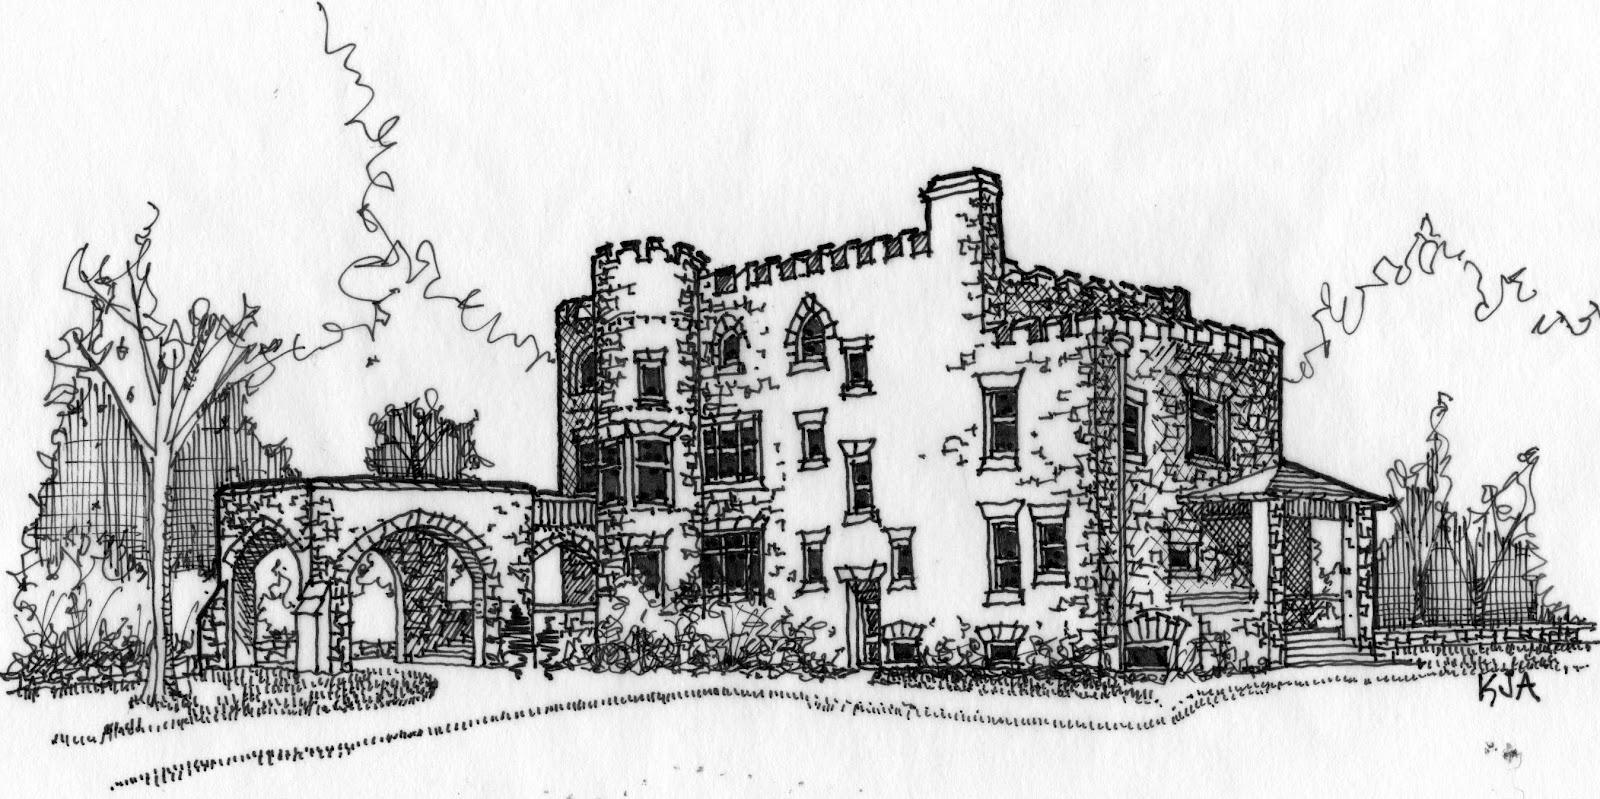 Hearthstone Castle Danbury, CT Sketch